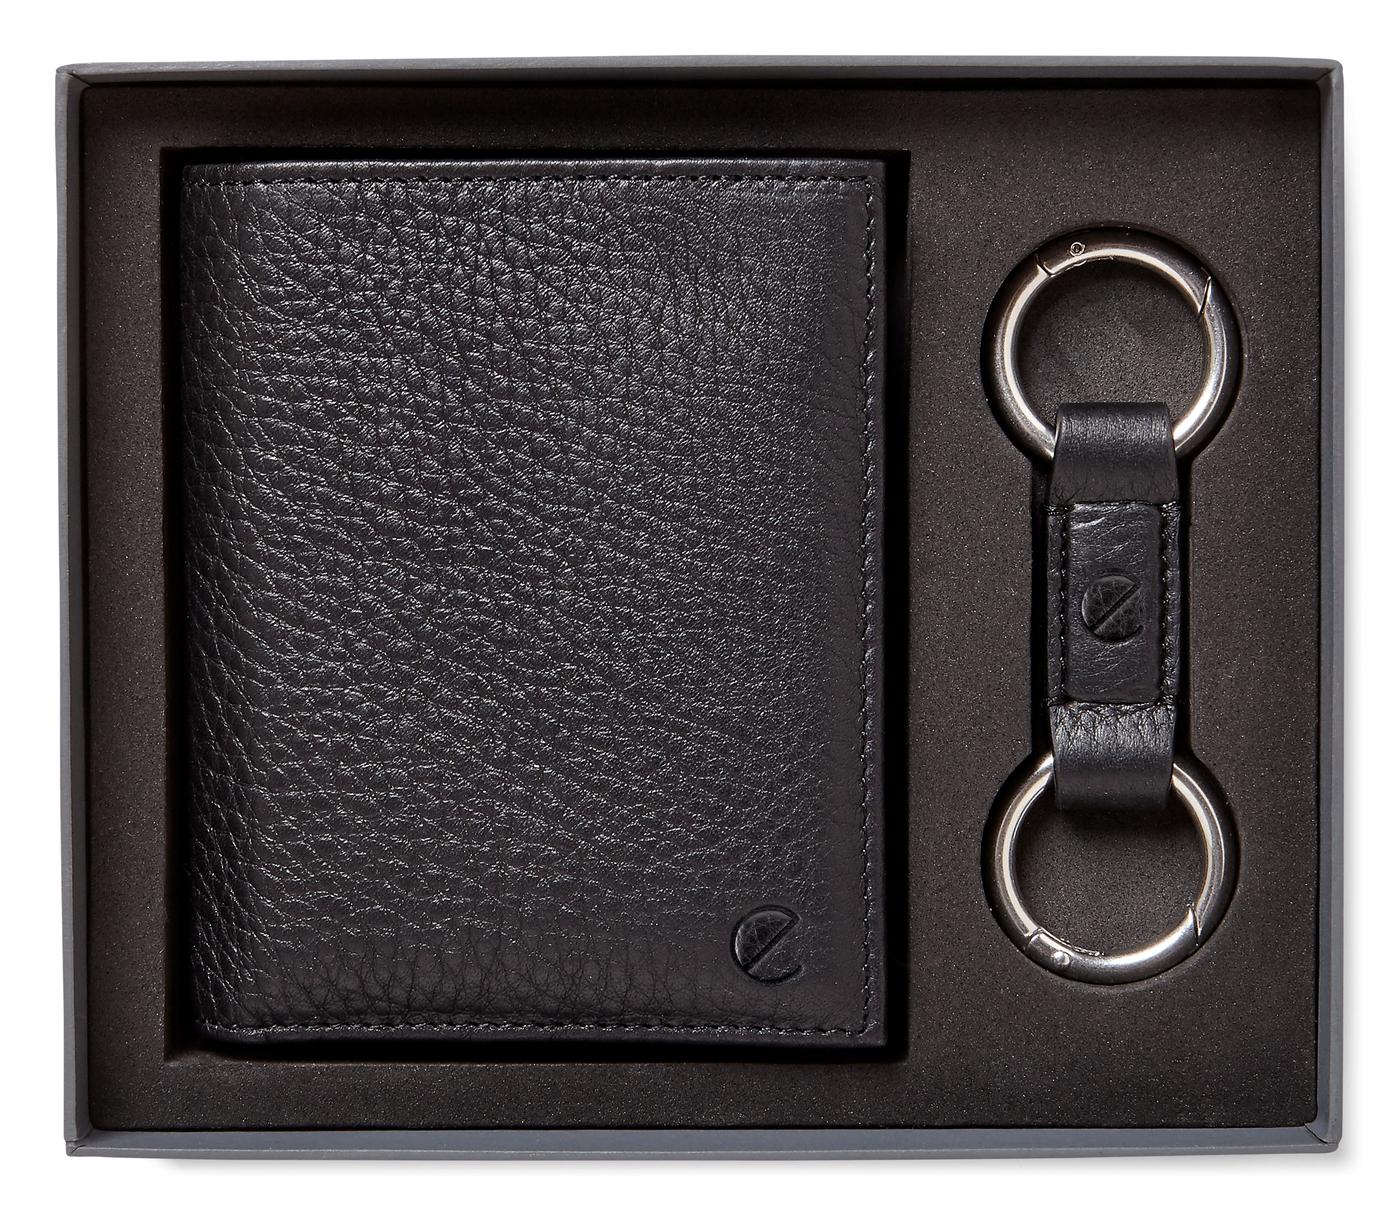 ECCO JOS Gift Box